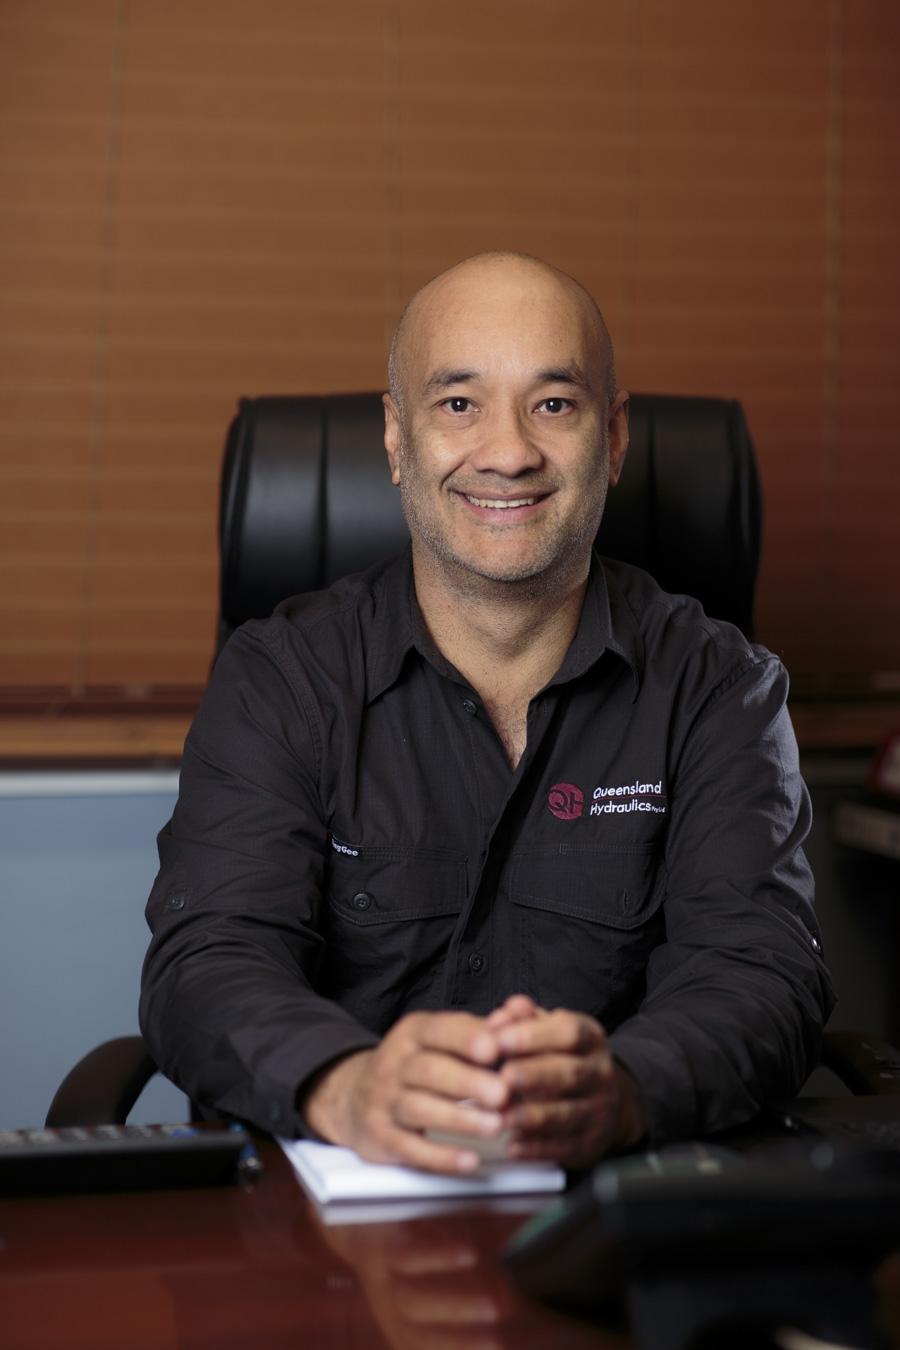 Jeff Managing Director